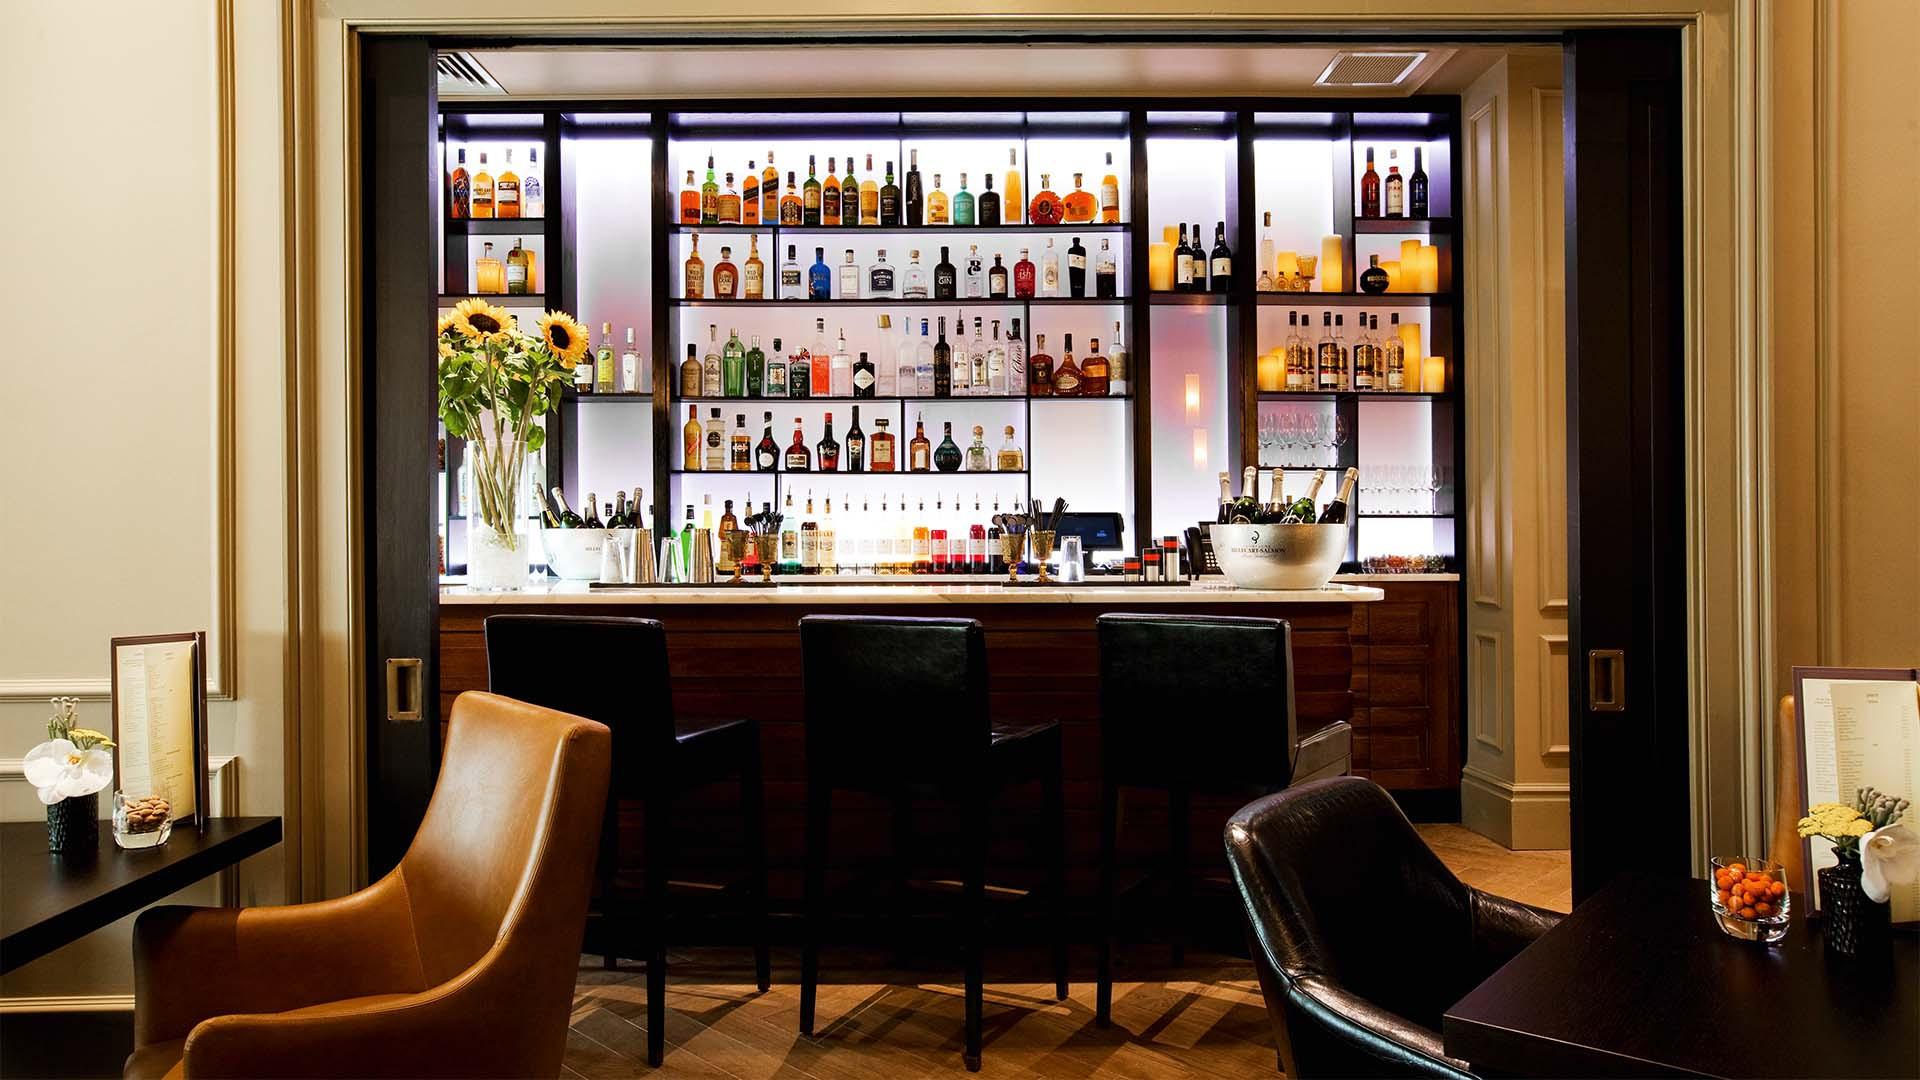 the bar at the Gainsborough